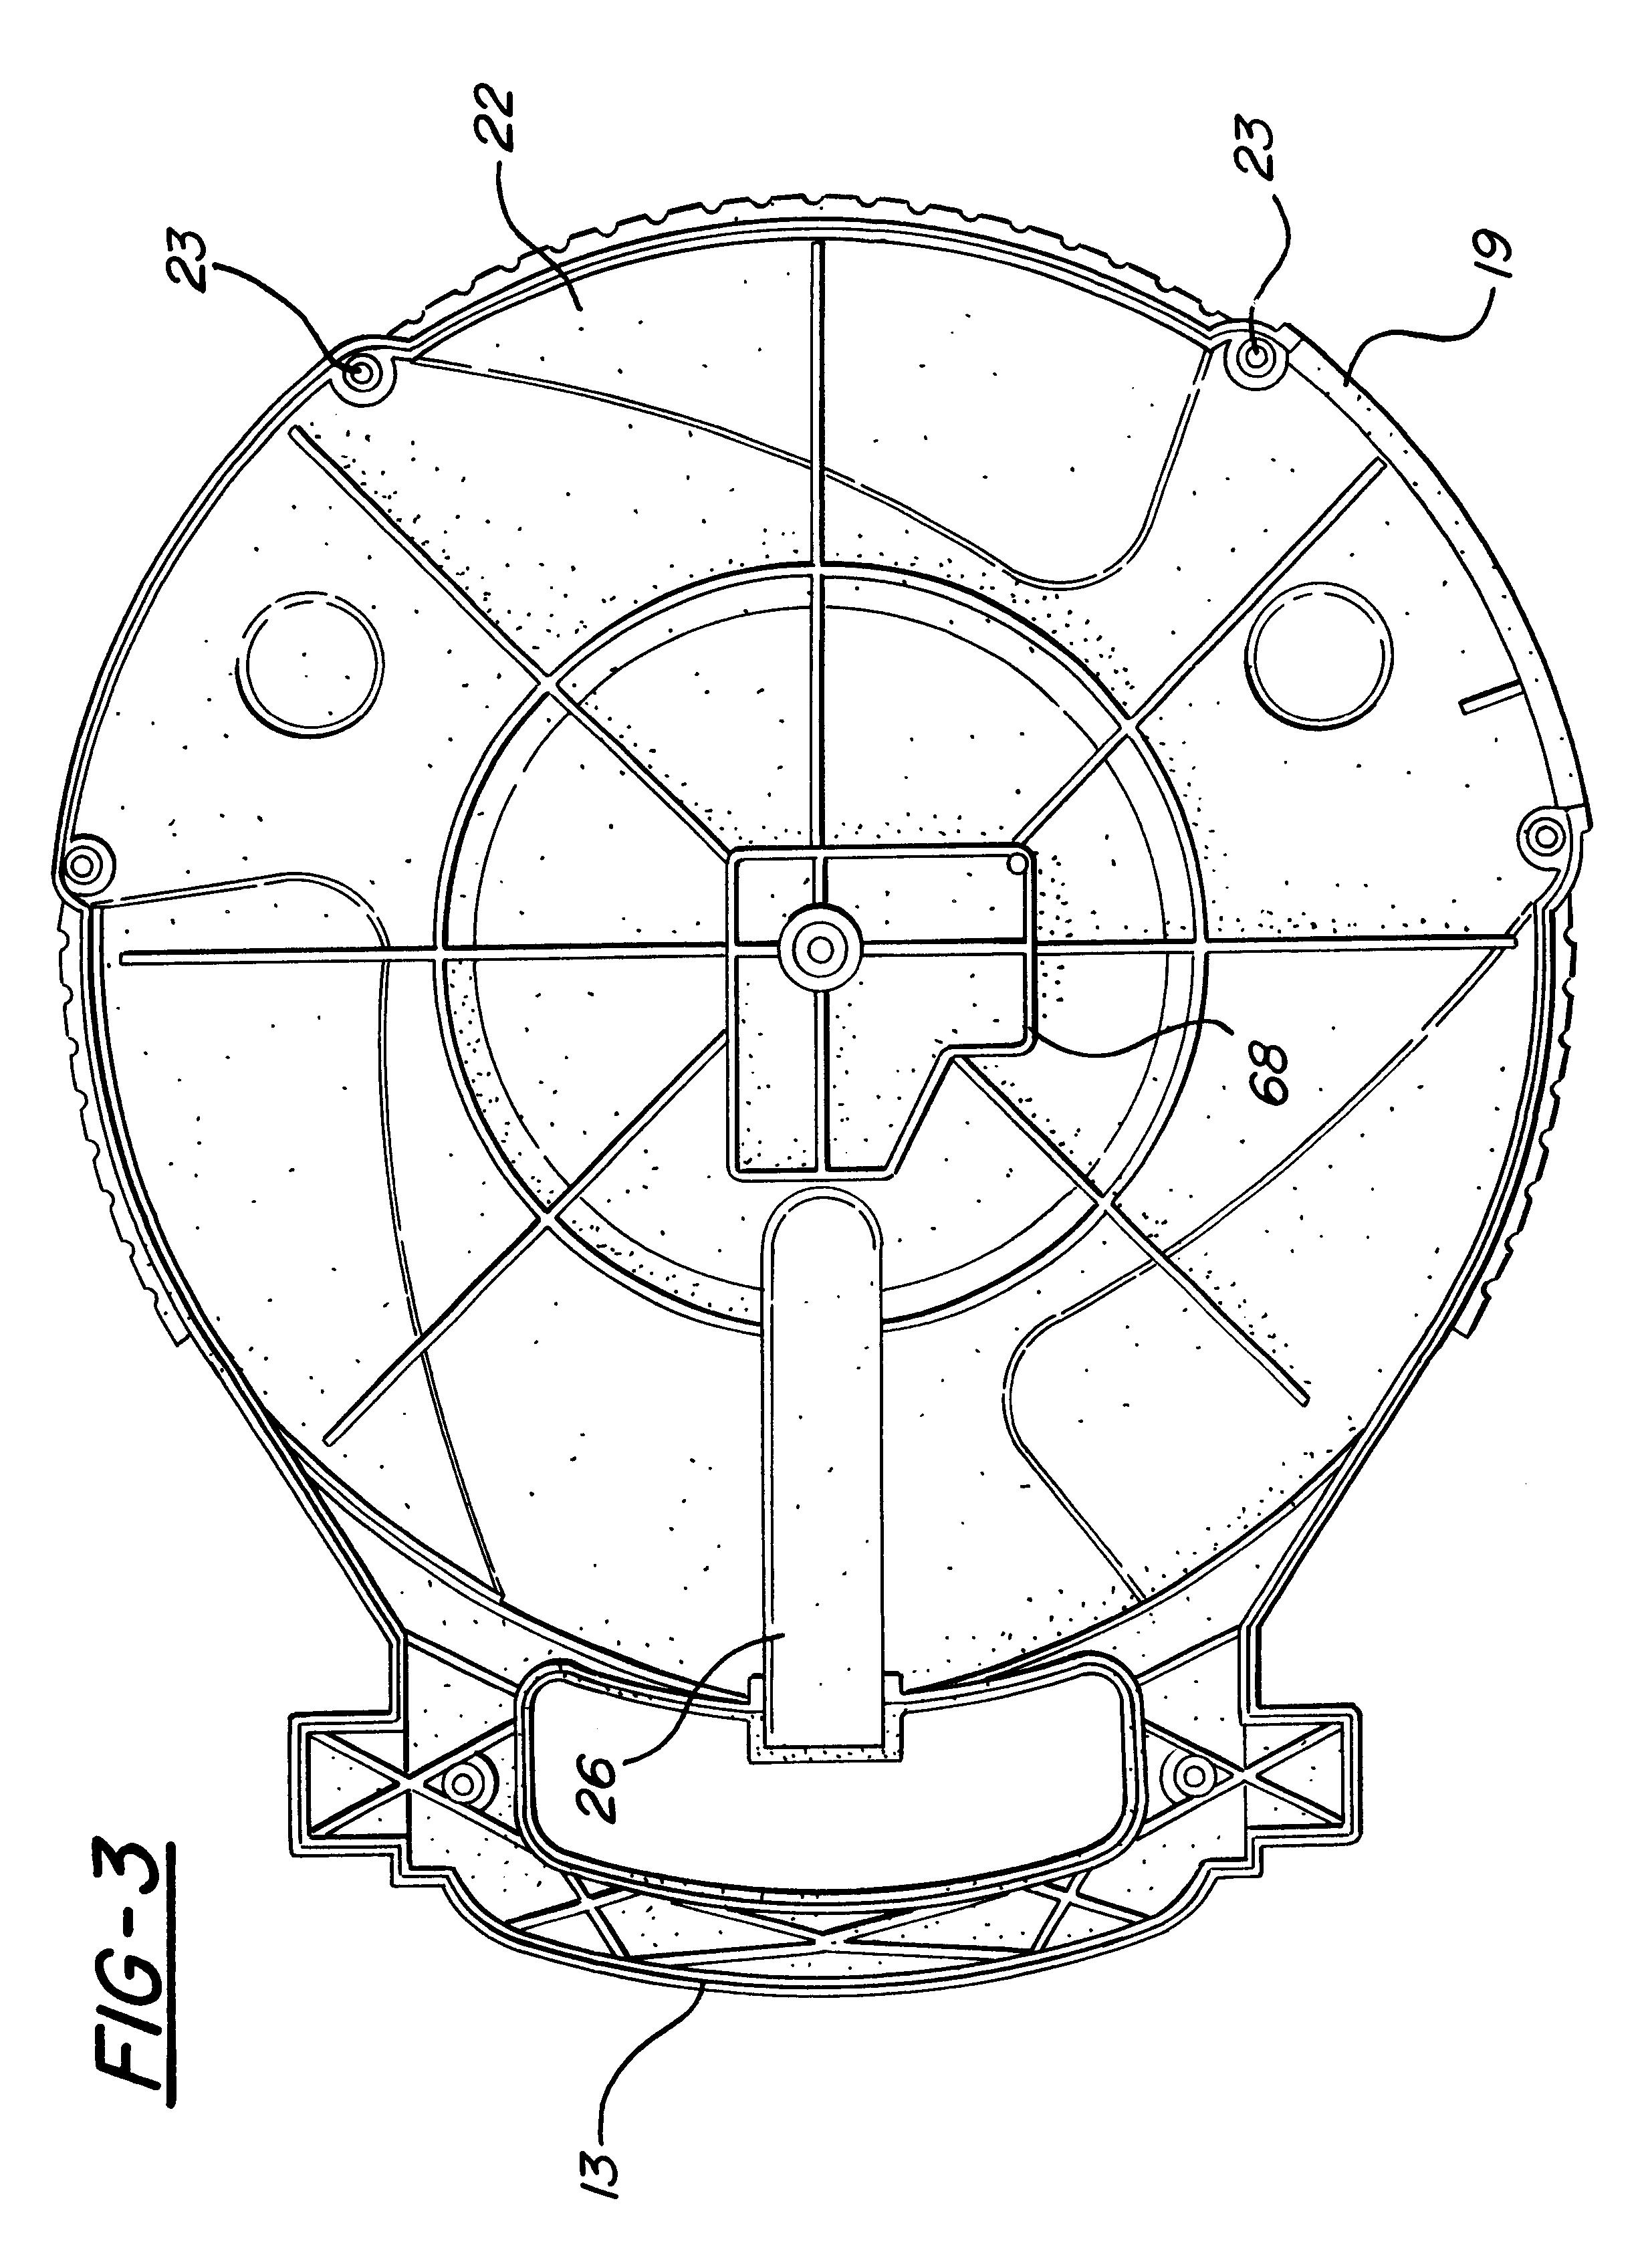 Ct70 Wiring Diagram Http Wwwpic2flycom 1970 Honda Ct70 Wiring